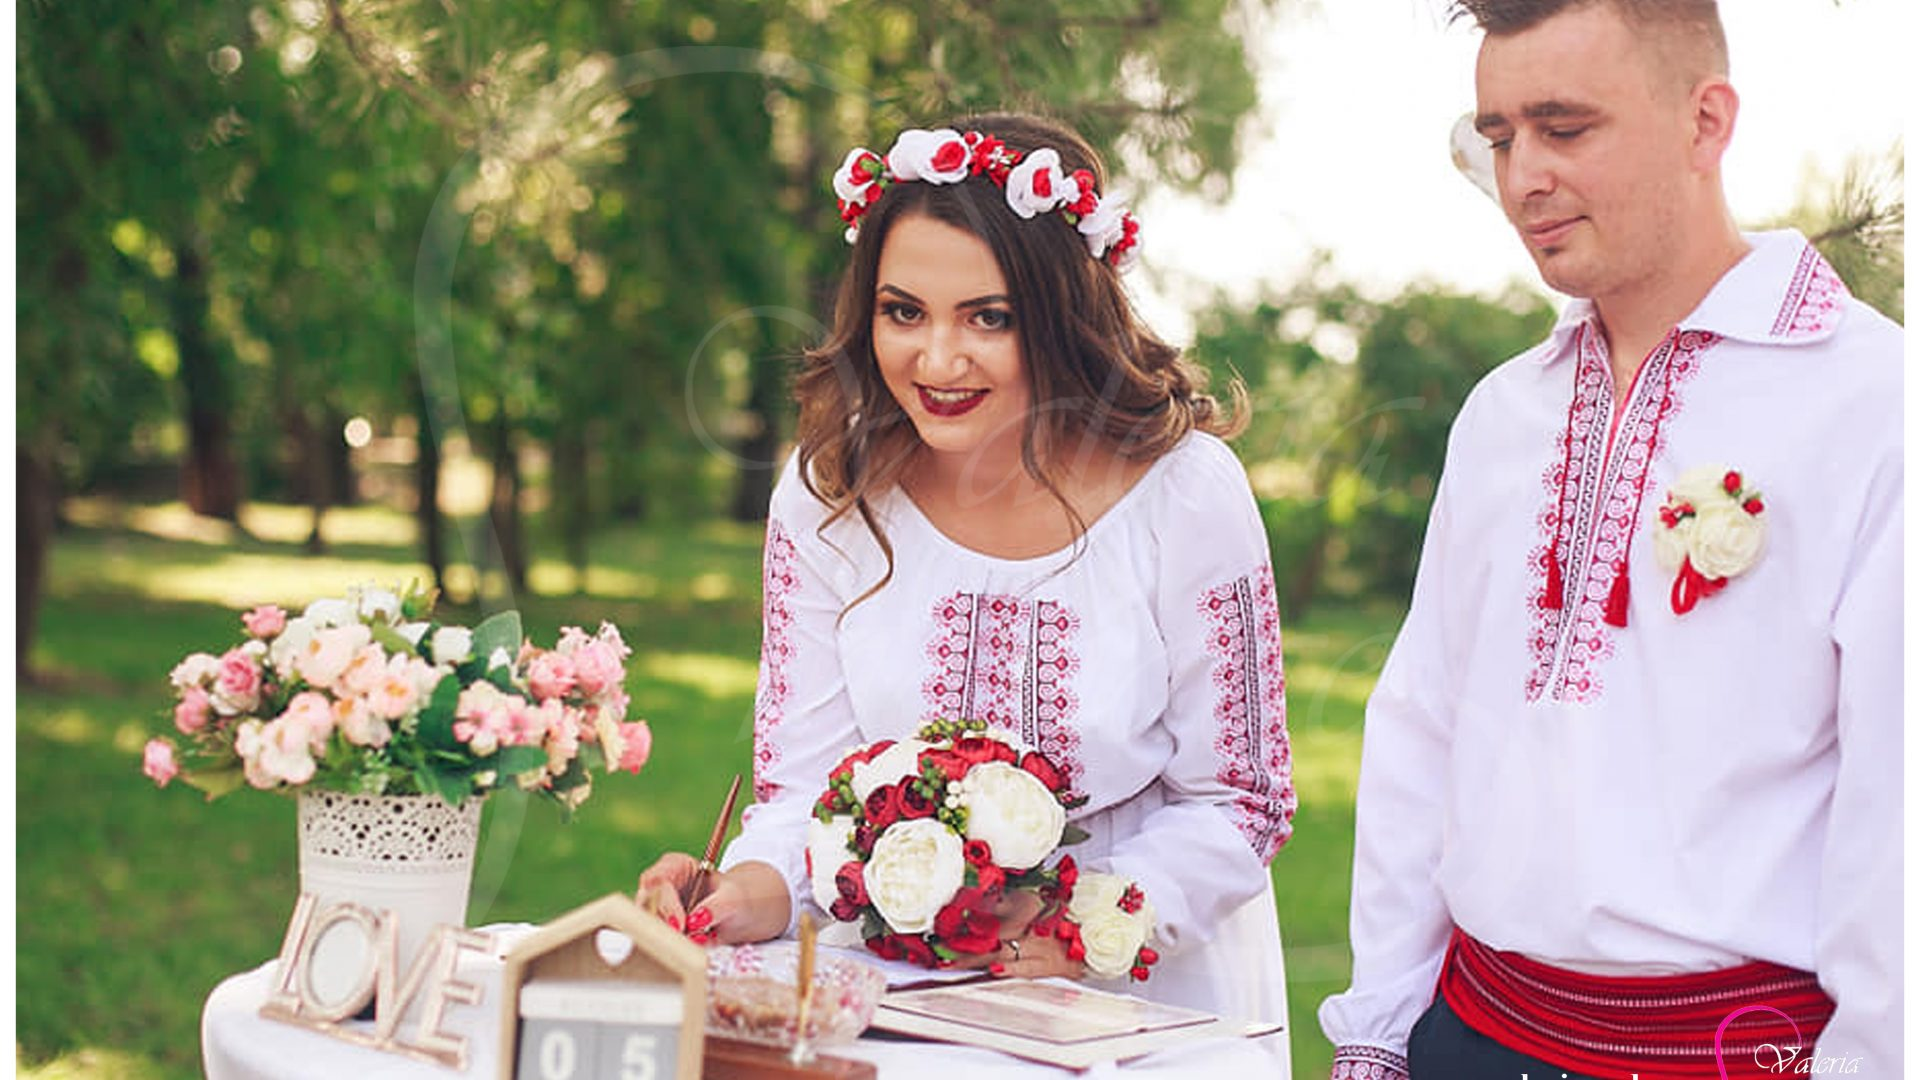 Inregistrarea casatoriei sub cerul liber Agentia Valeria Mariage 069787665 www.valeria (10)